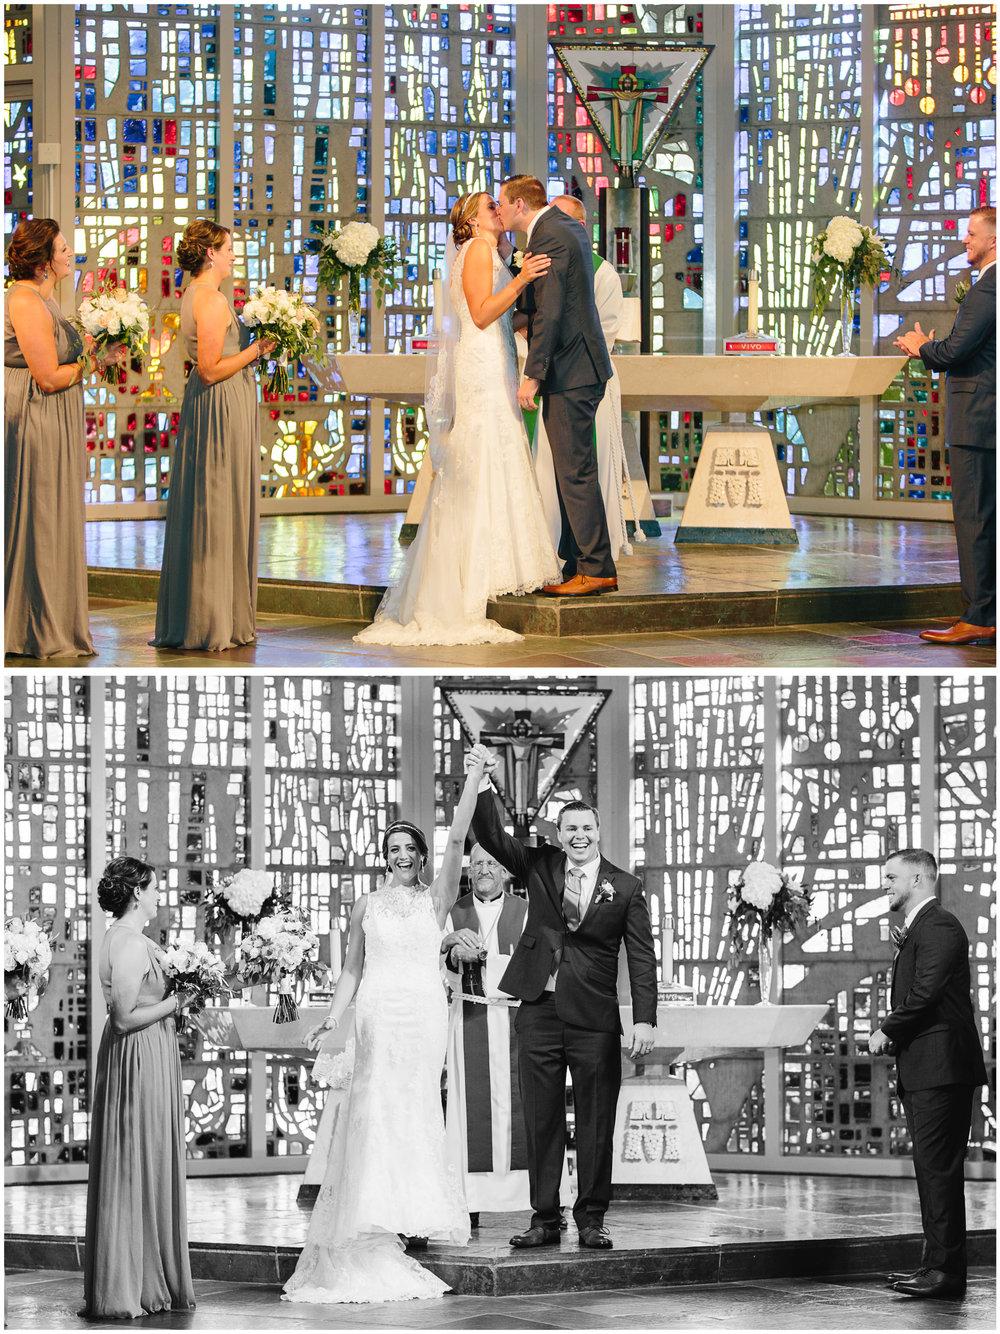 ann_arbor_michigan_wedding_67.jpg